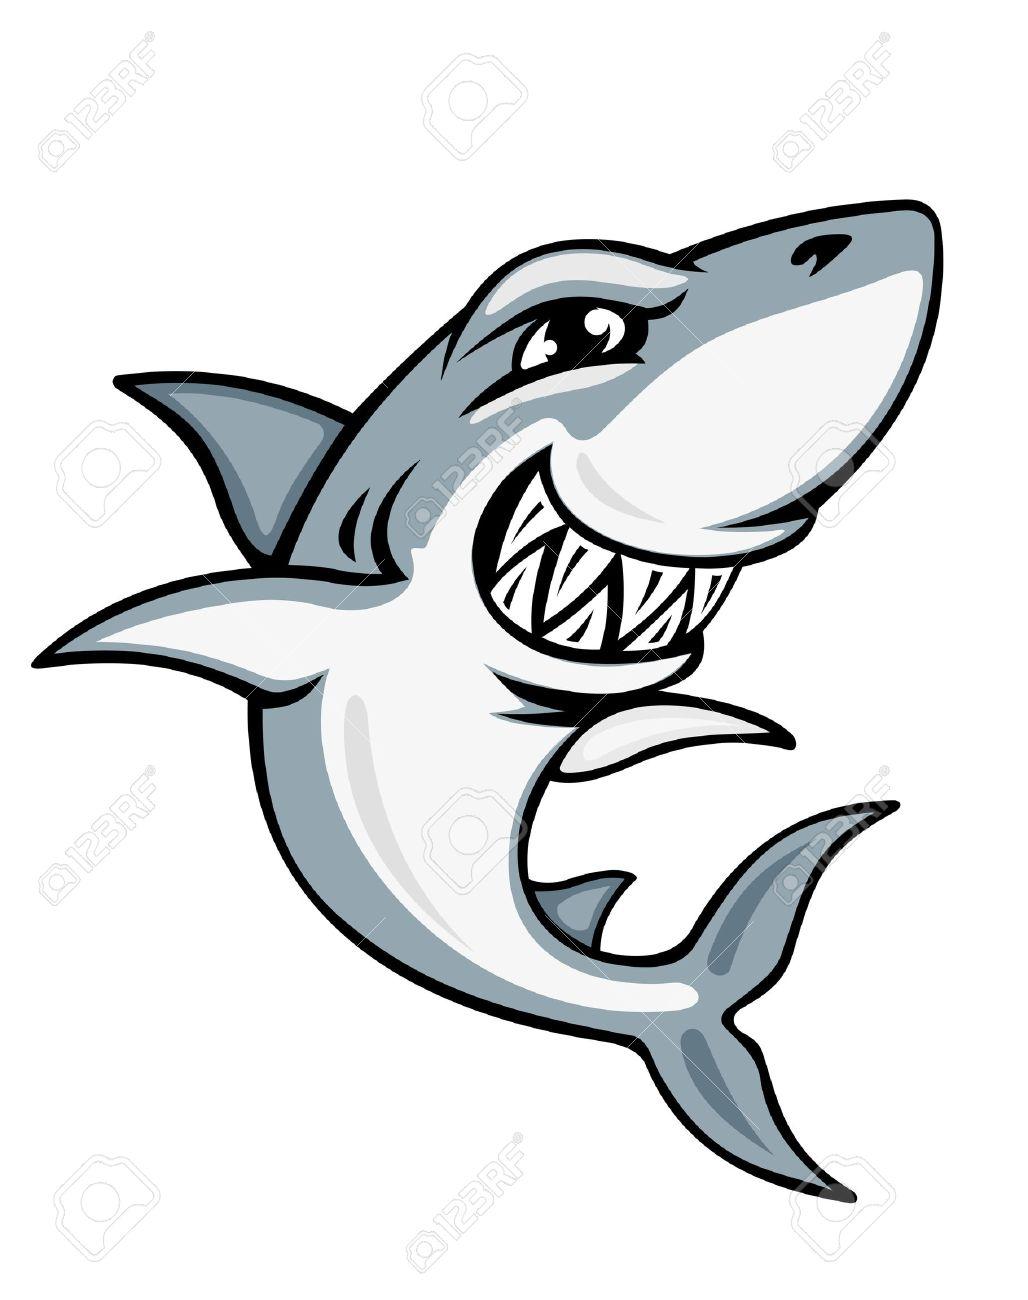 1028x1300 Cartoon Smiling Shark For Mascot And Emblem Design Royalty Free